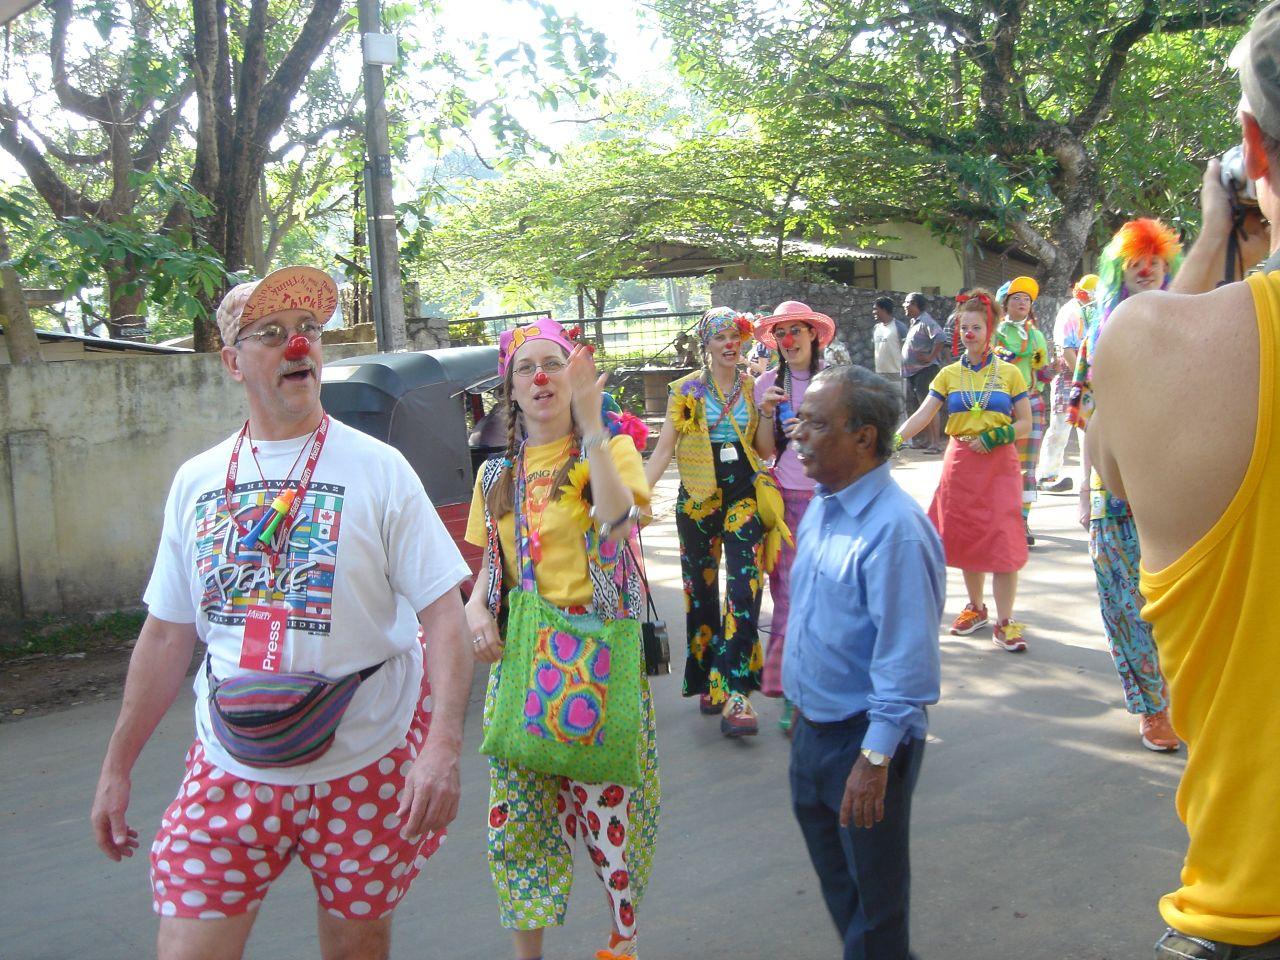 http://4.bp.blogspot.com/-yPQjwP27-G4/TseJh16zbaI/AAAAAAABB7c/uaYXRkmlmOw/s1600/Patch_Adams_in_Sri_Lanka.jpg